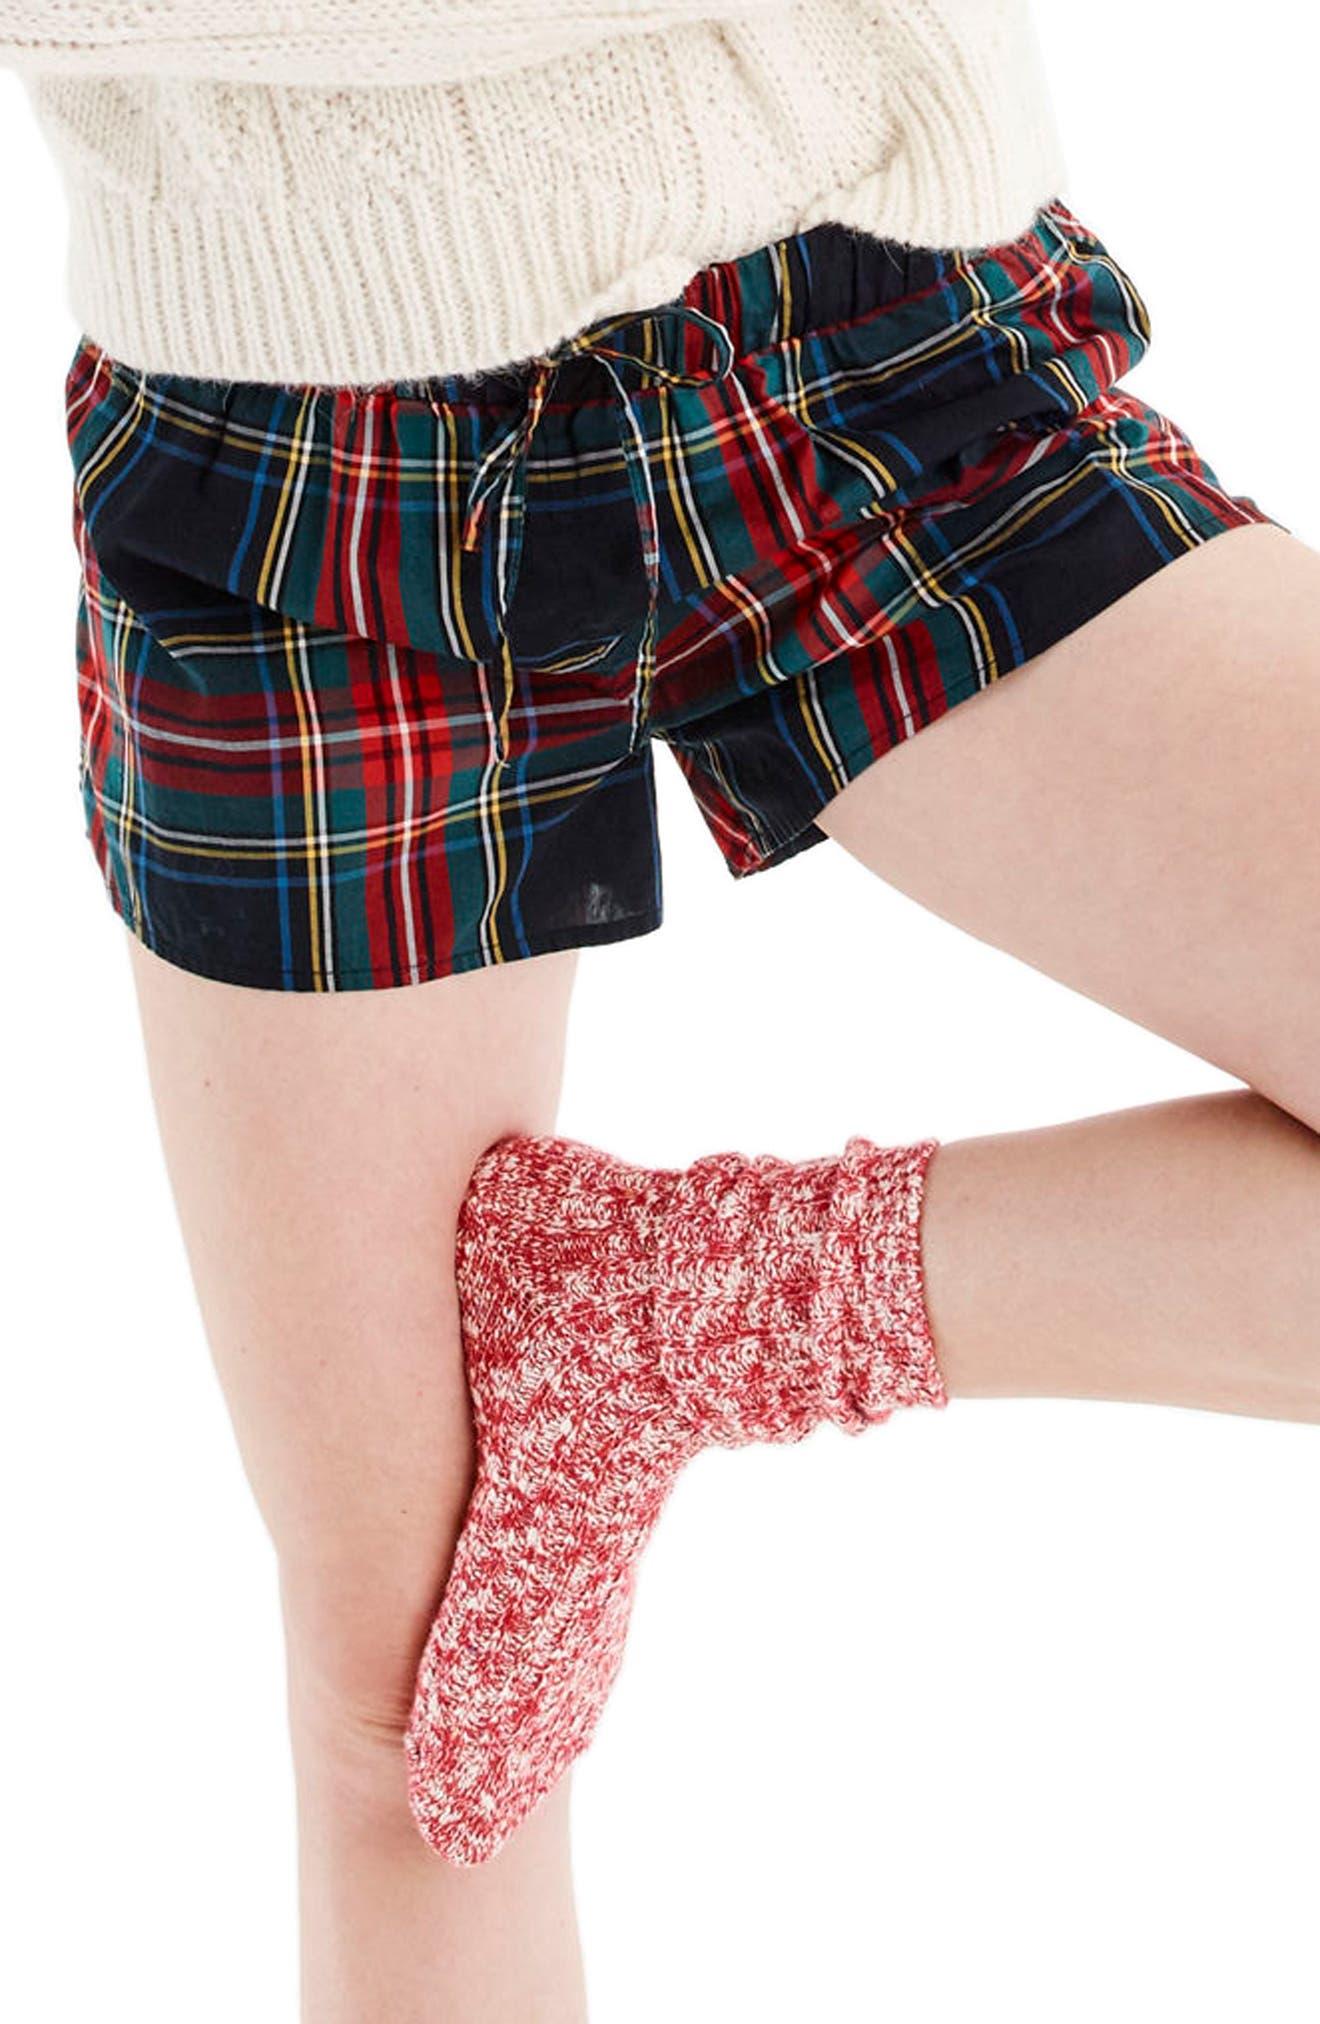 Alternate Image 1 Selected - J.Crew Tartan Plaid Pajama Shorts